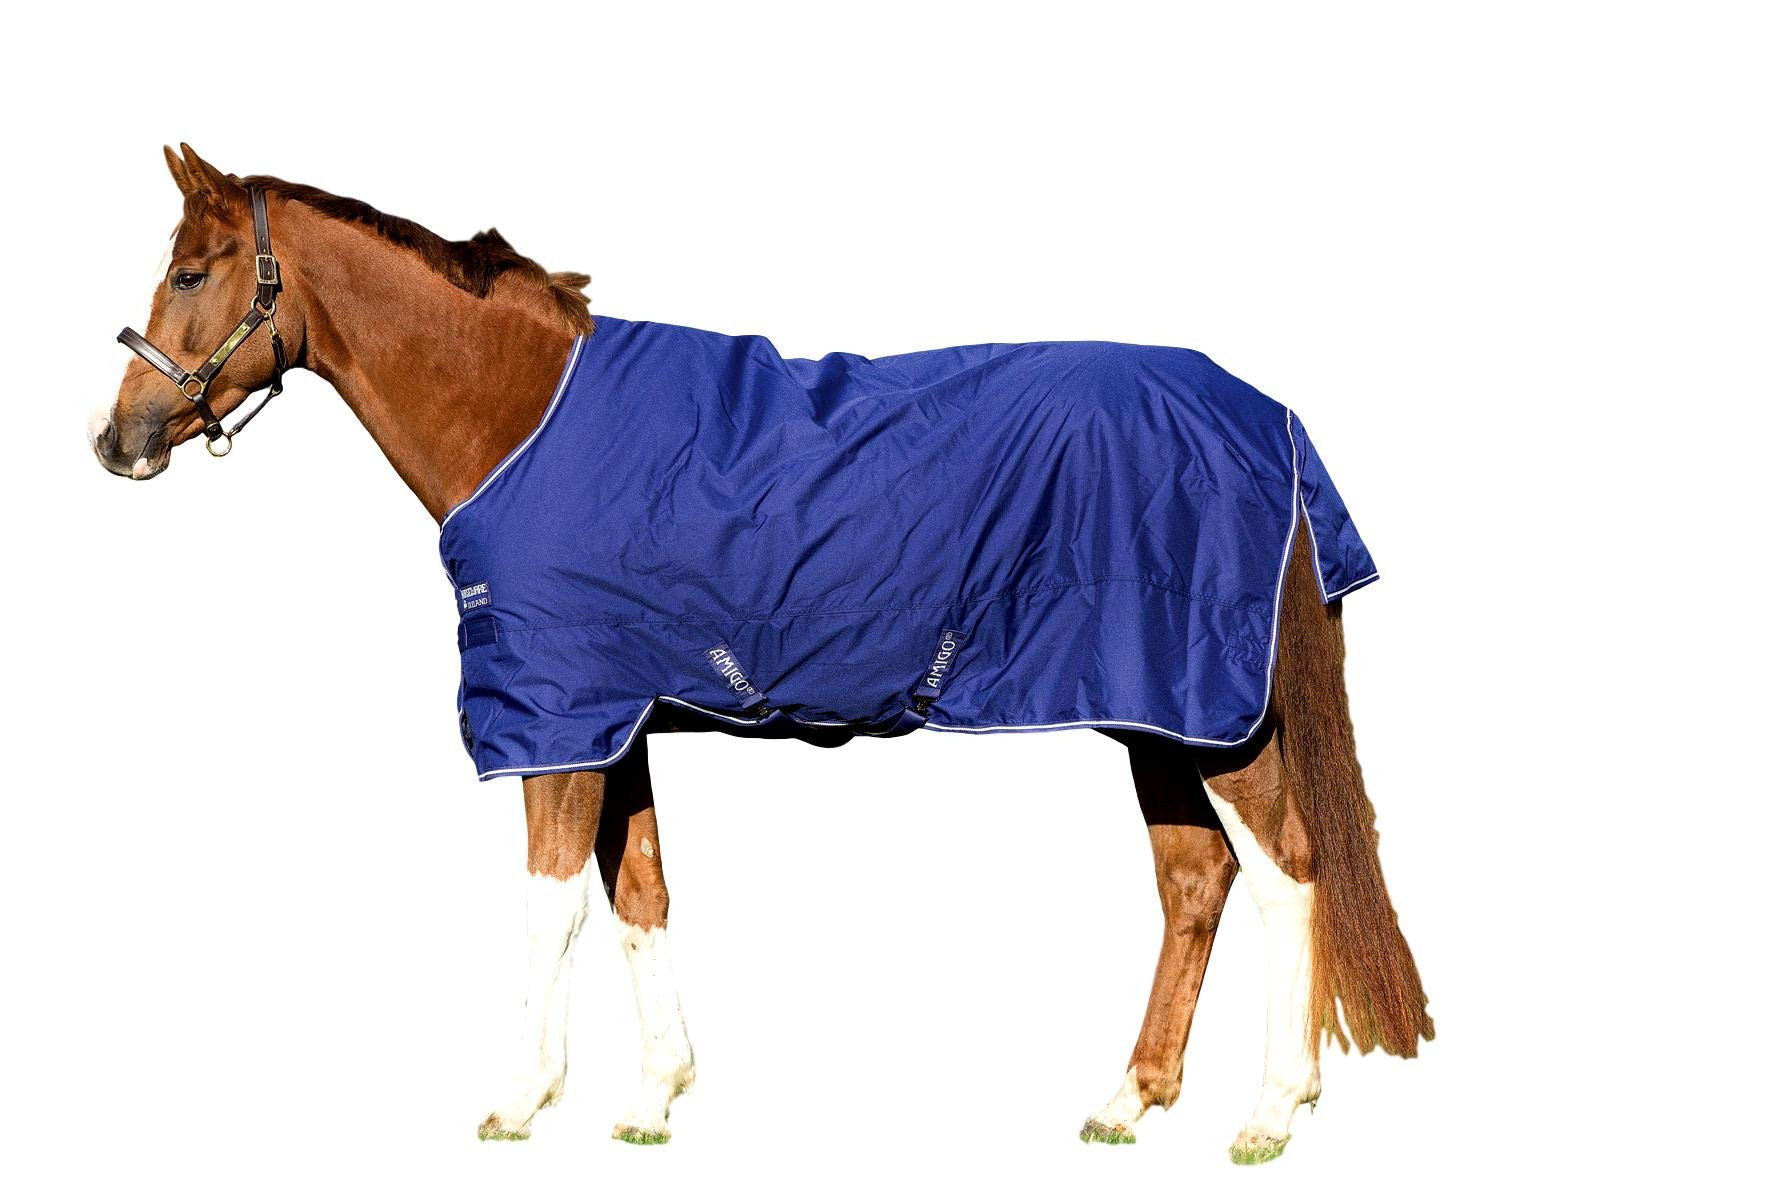 Horseware Amigo Hero 900 Turnout Sheet Lite 0g Blue/Ivory 78 by Horseware